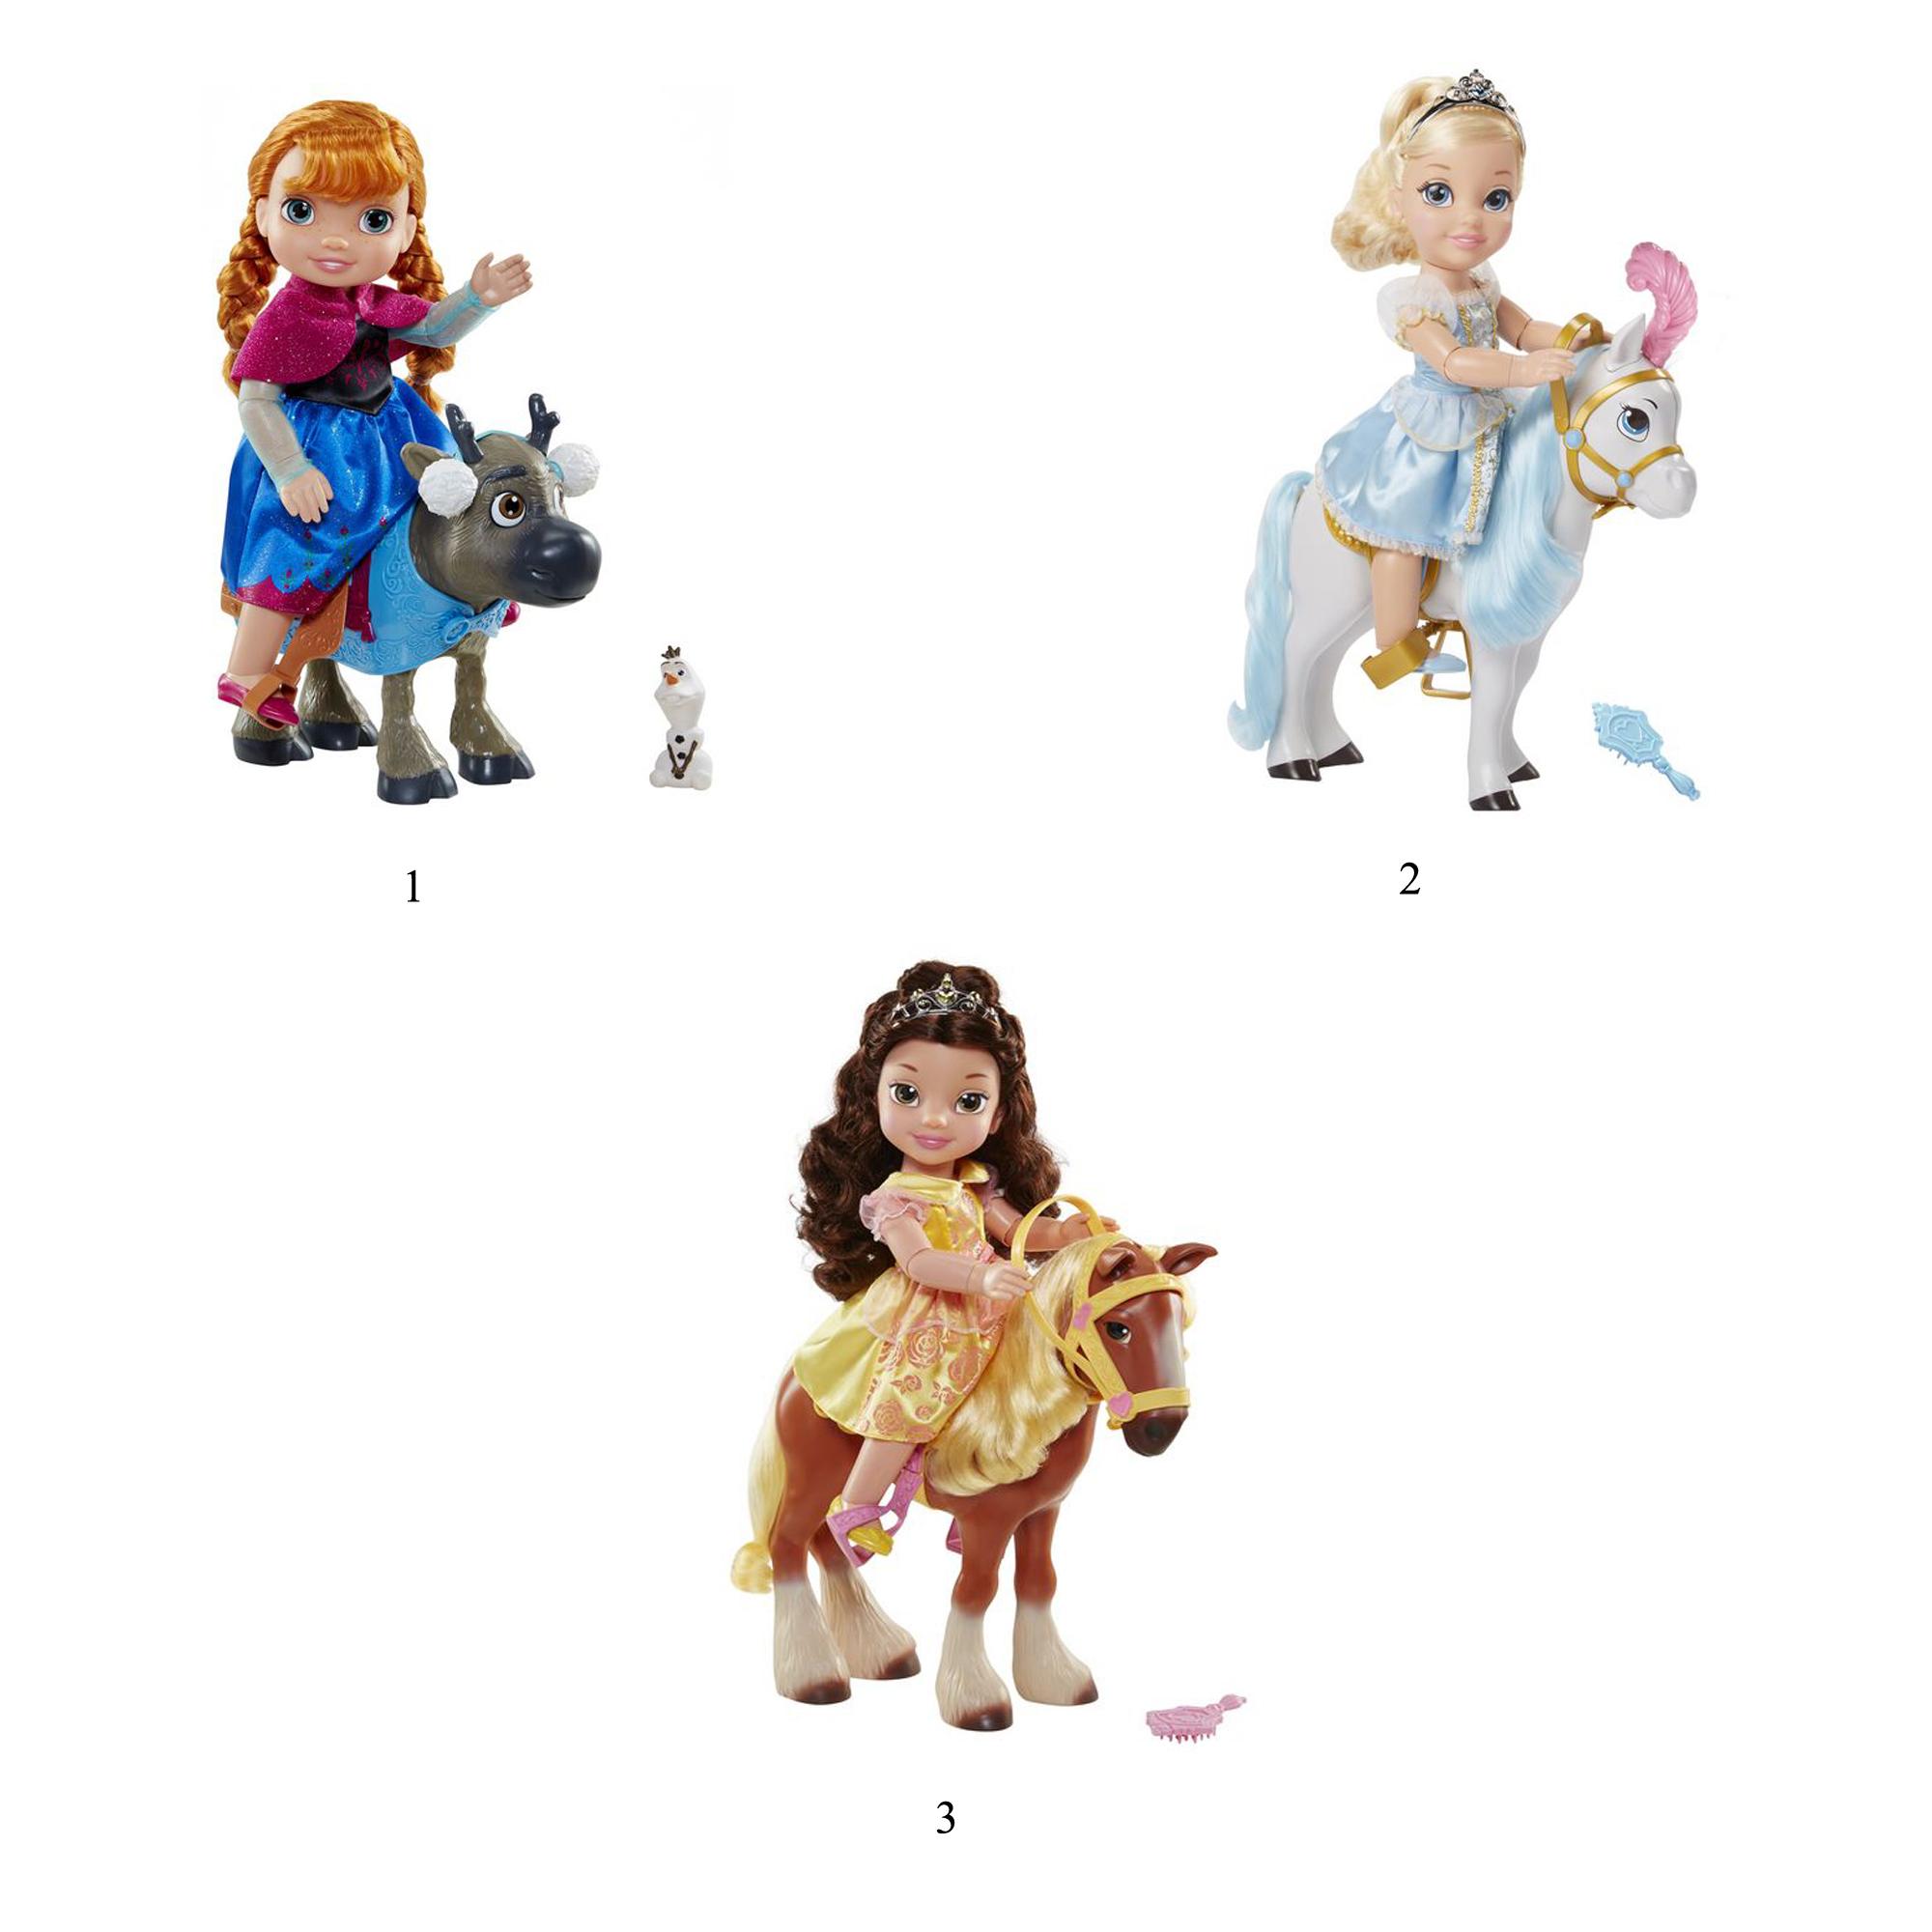 Куклы Дисней - Принцесса с животнымЗолушка<br>Куклы Дисней - Принцесса с животным<br>